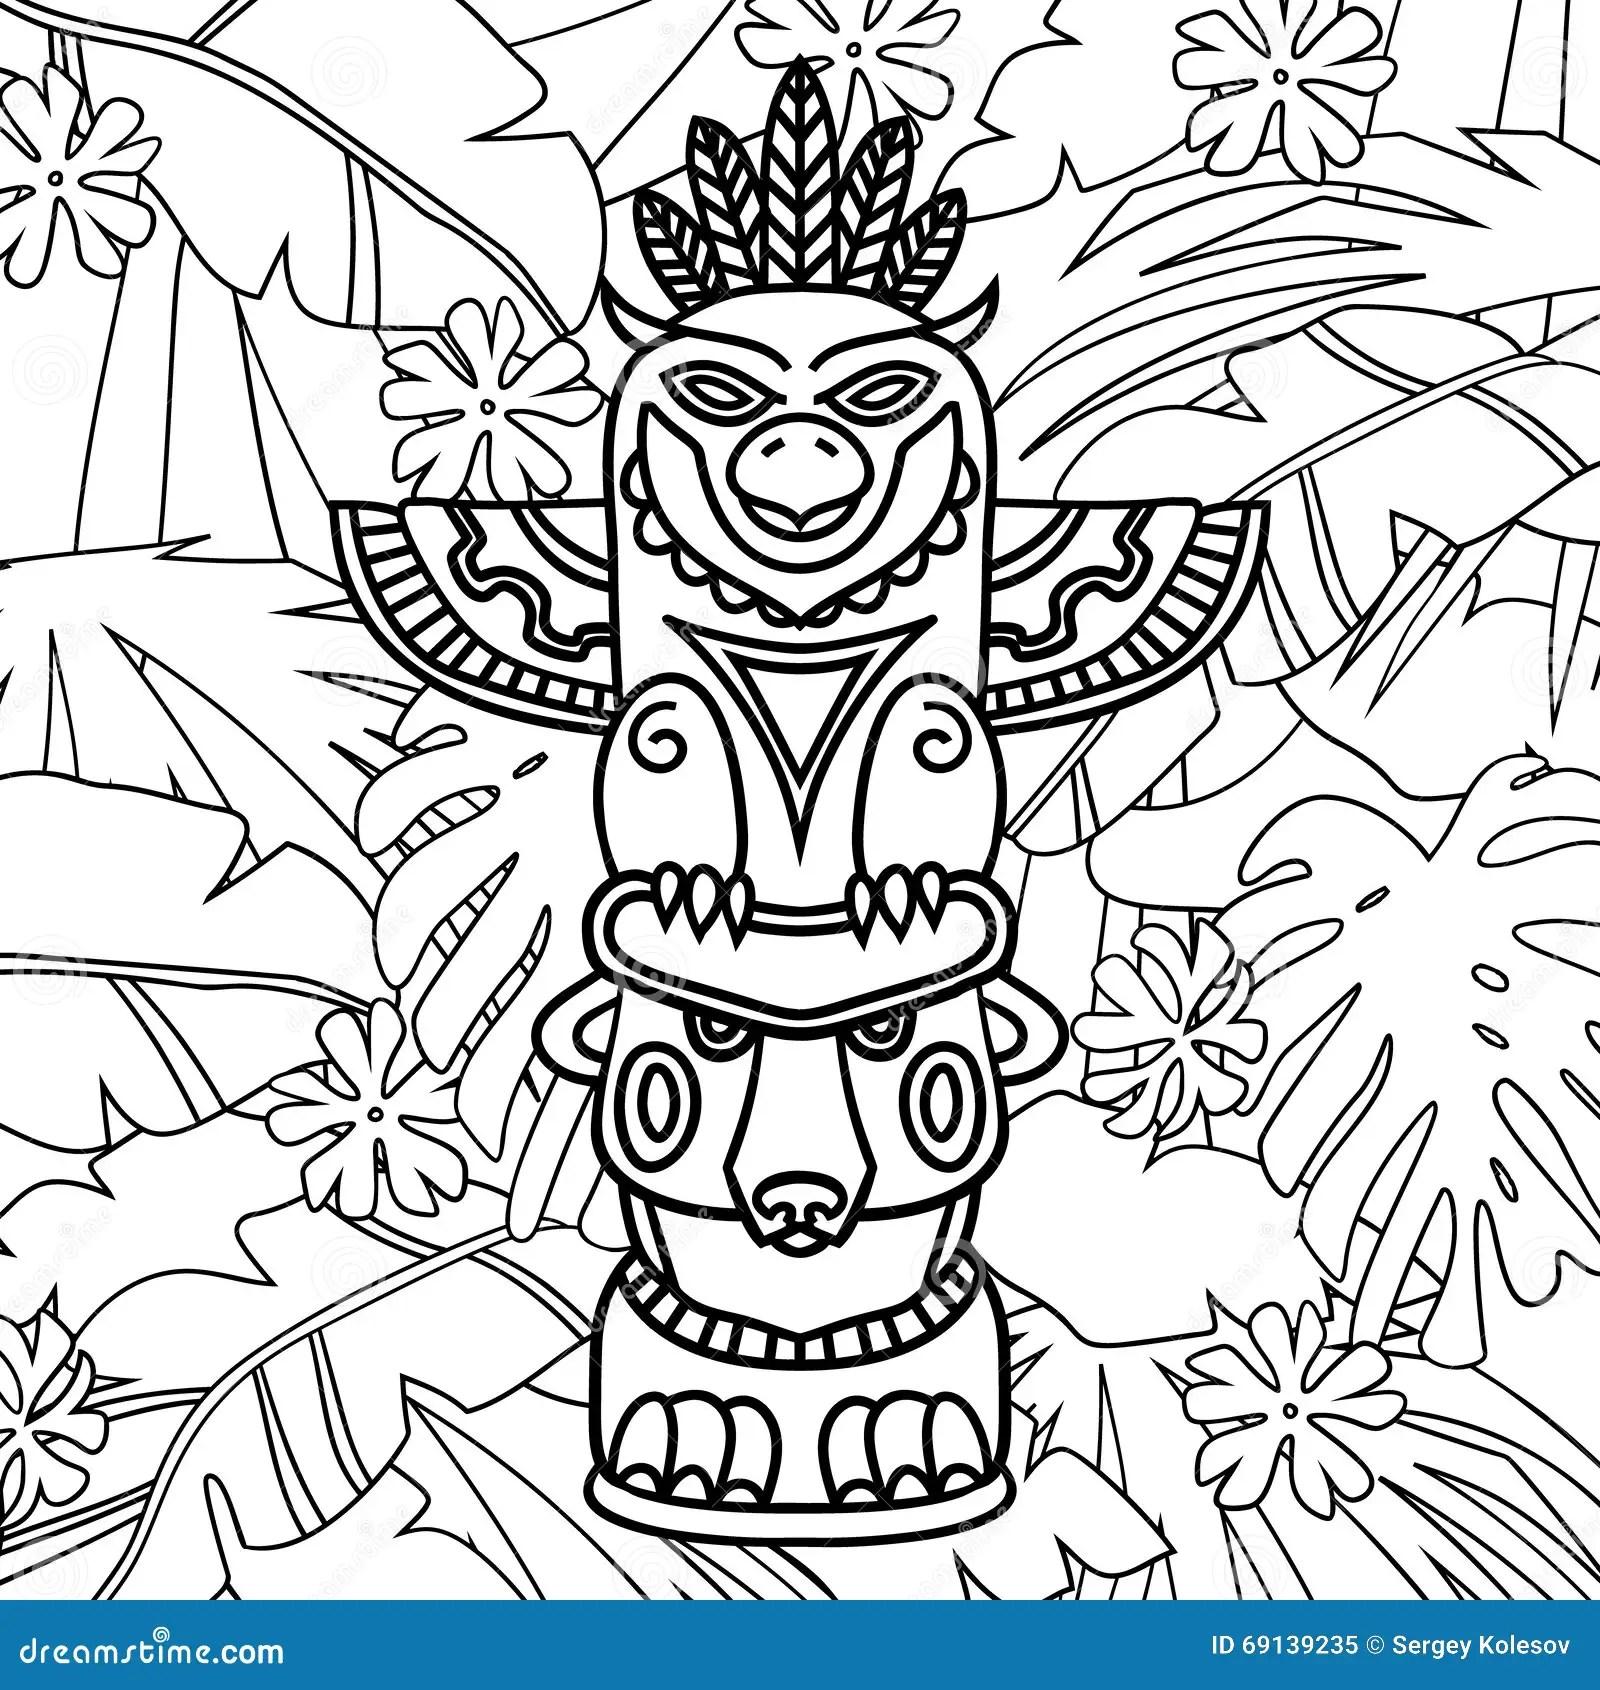 Printable Totem Pole Worksheet